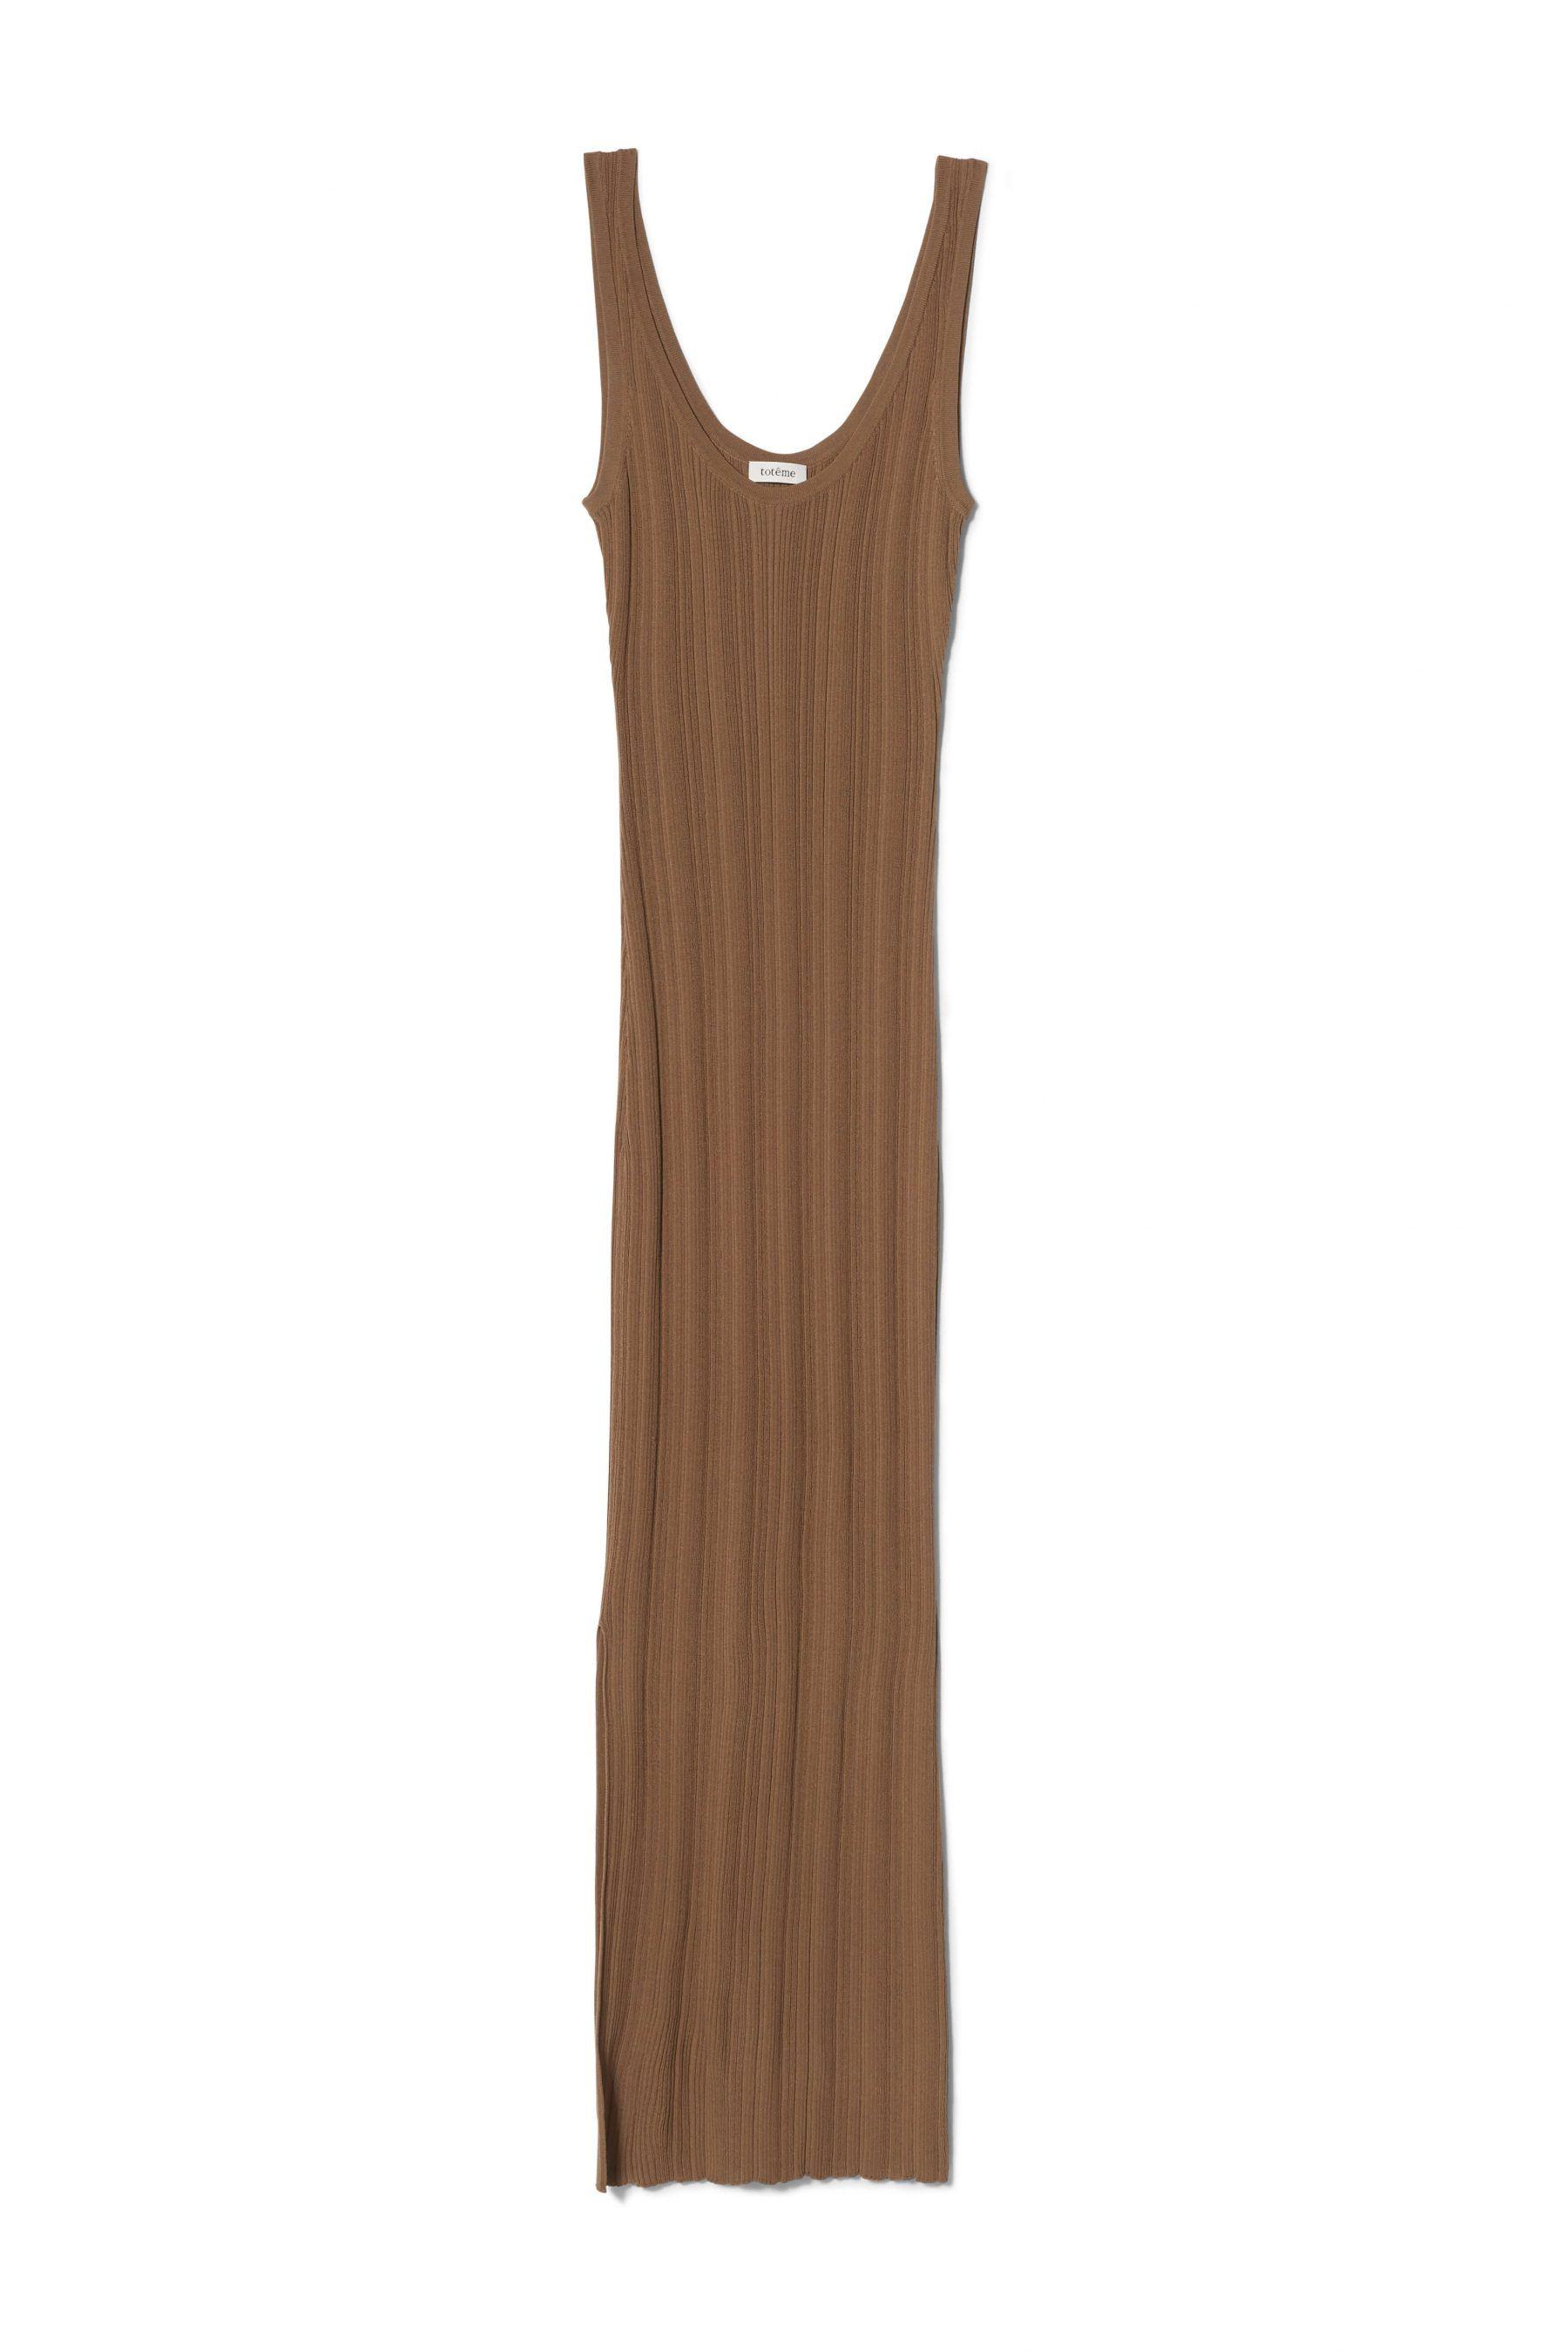 Dresses Skirts Dresses Dress Skirt Slip Dress [ 2700 x 1800 Pixel ]